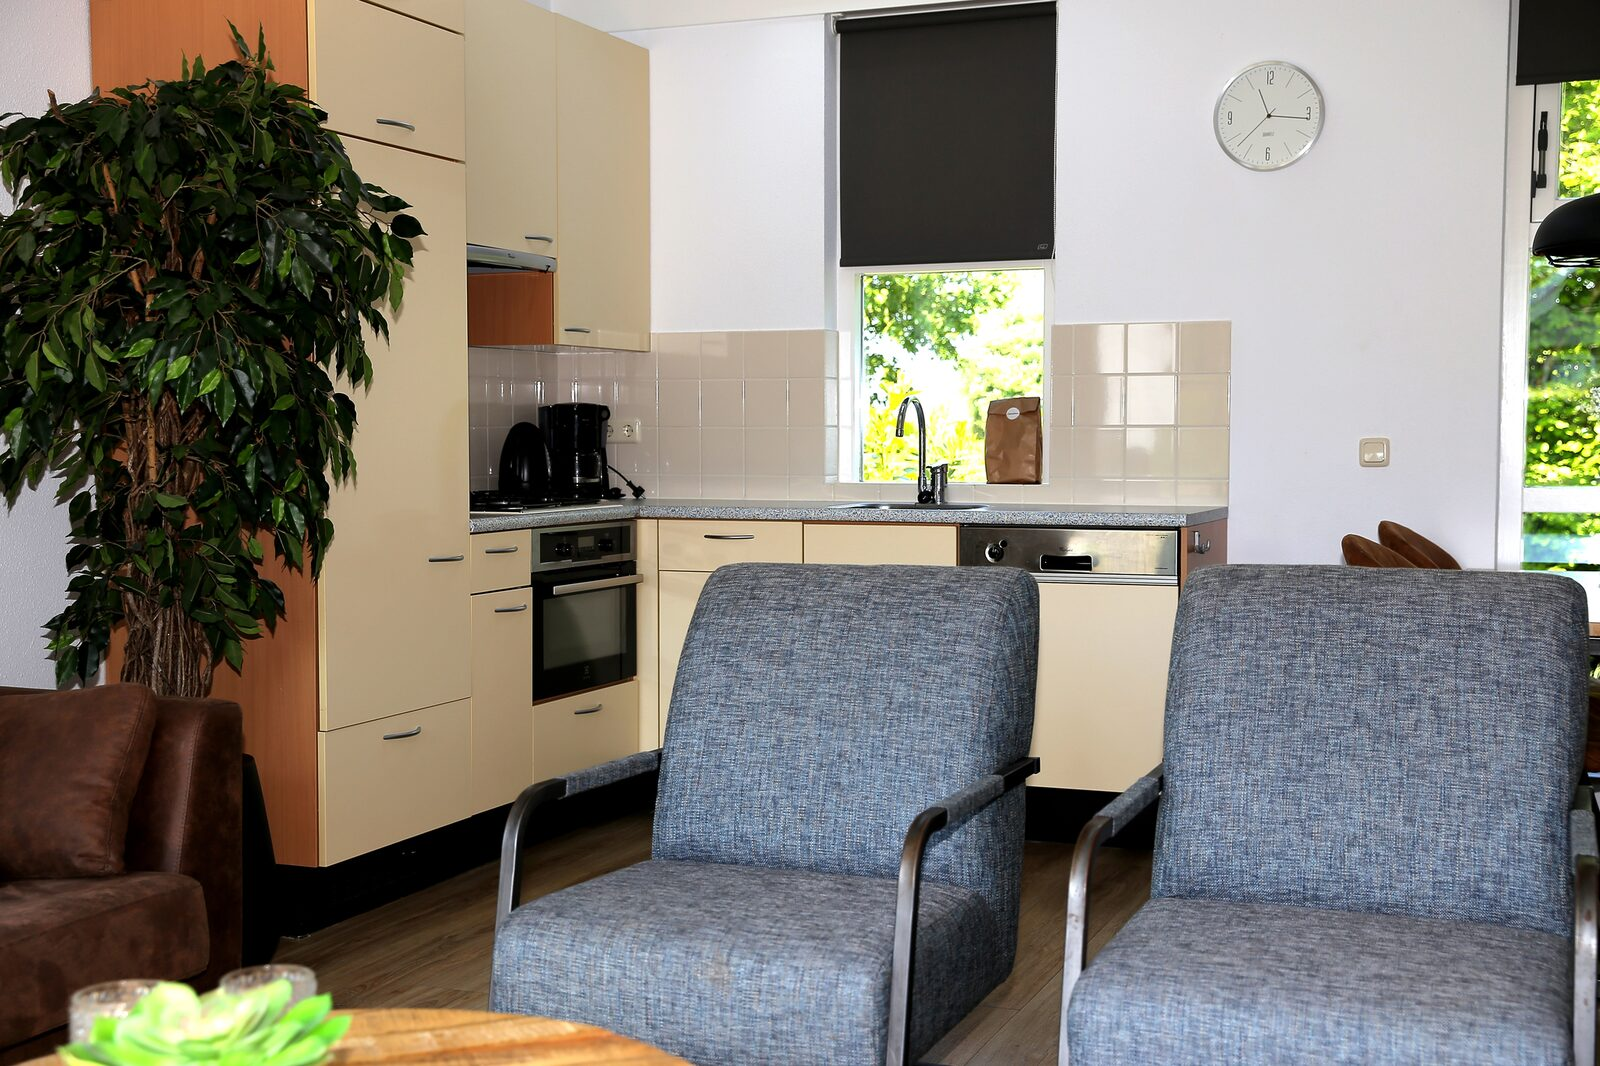 Holiday home Polder 4 Comfort